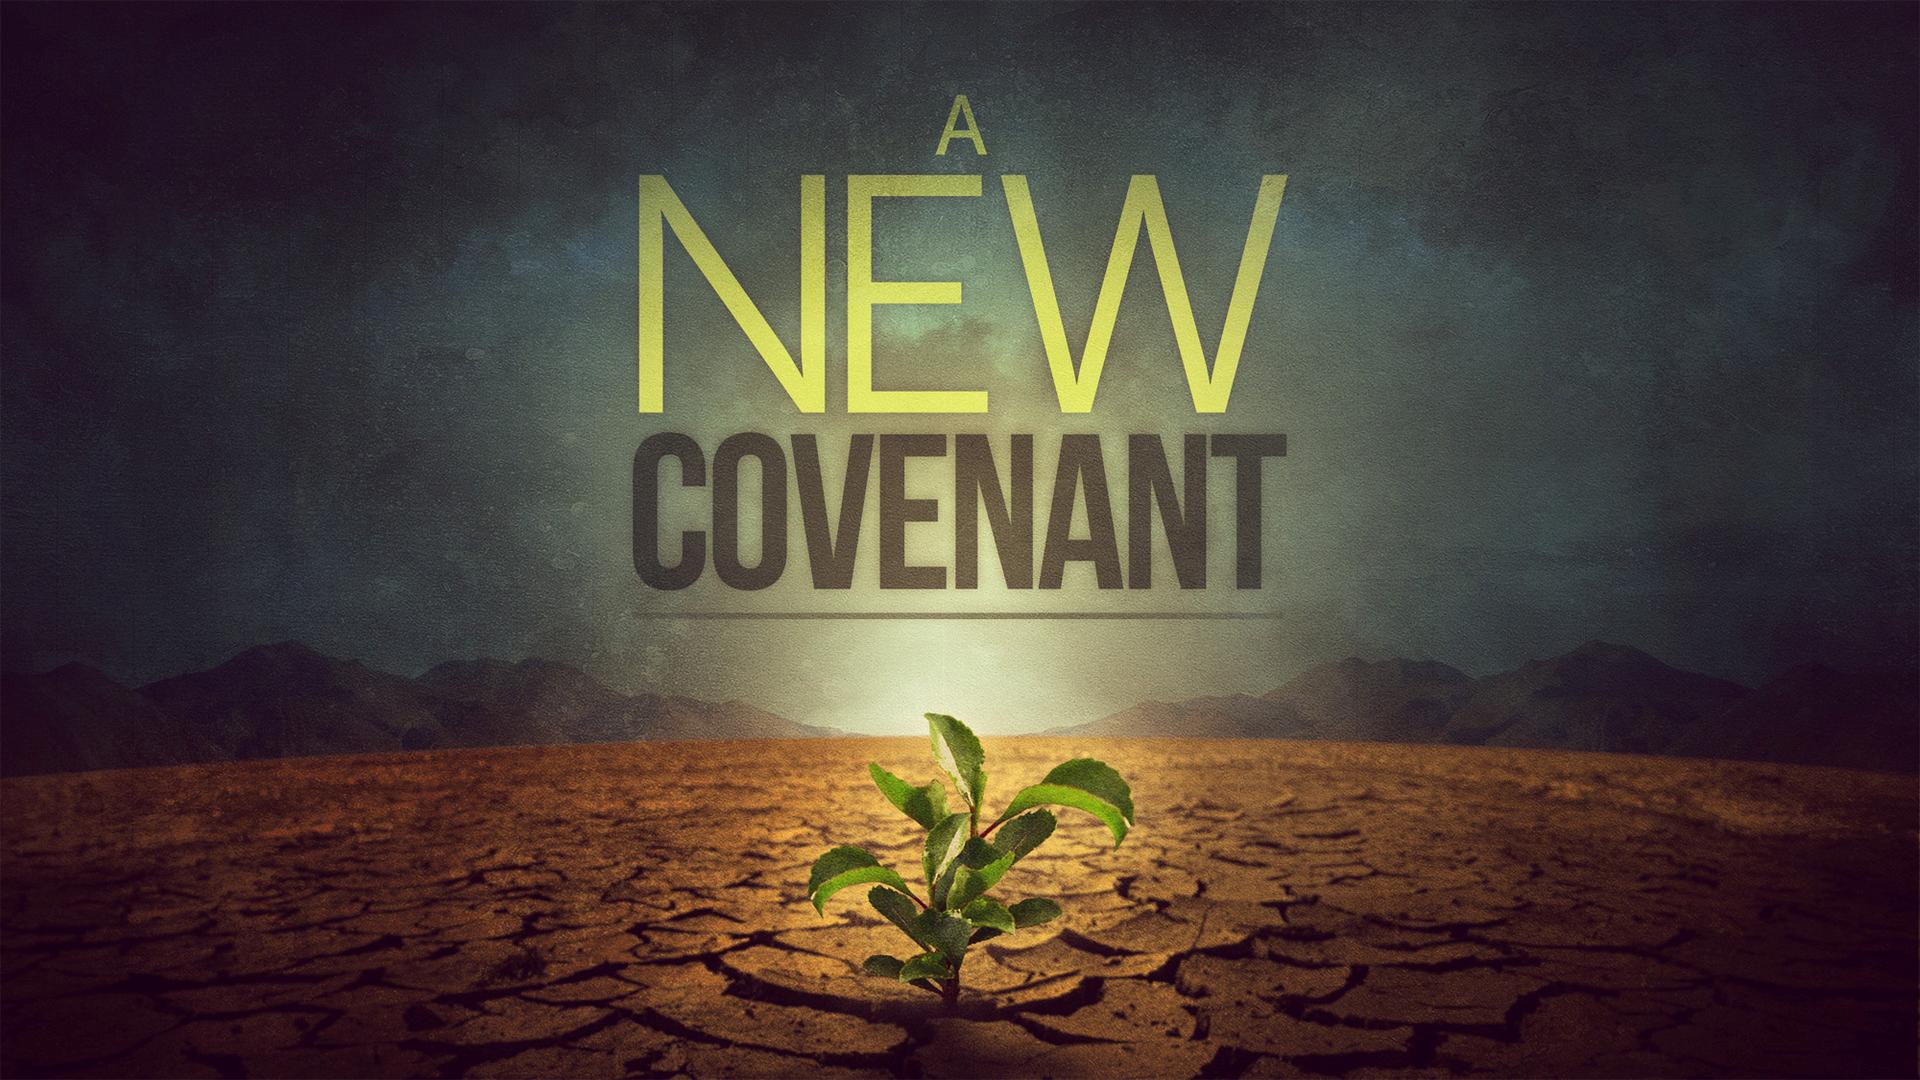 United Methodist Church Of Kent Covenant Renewal Service